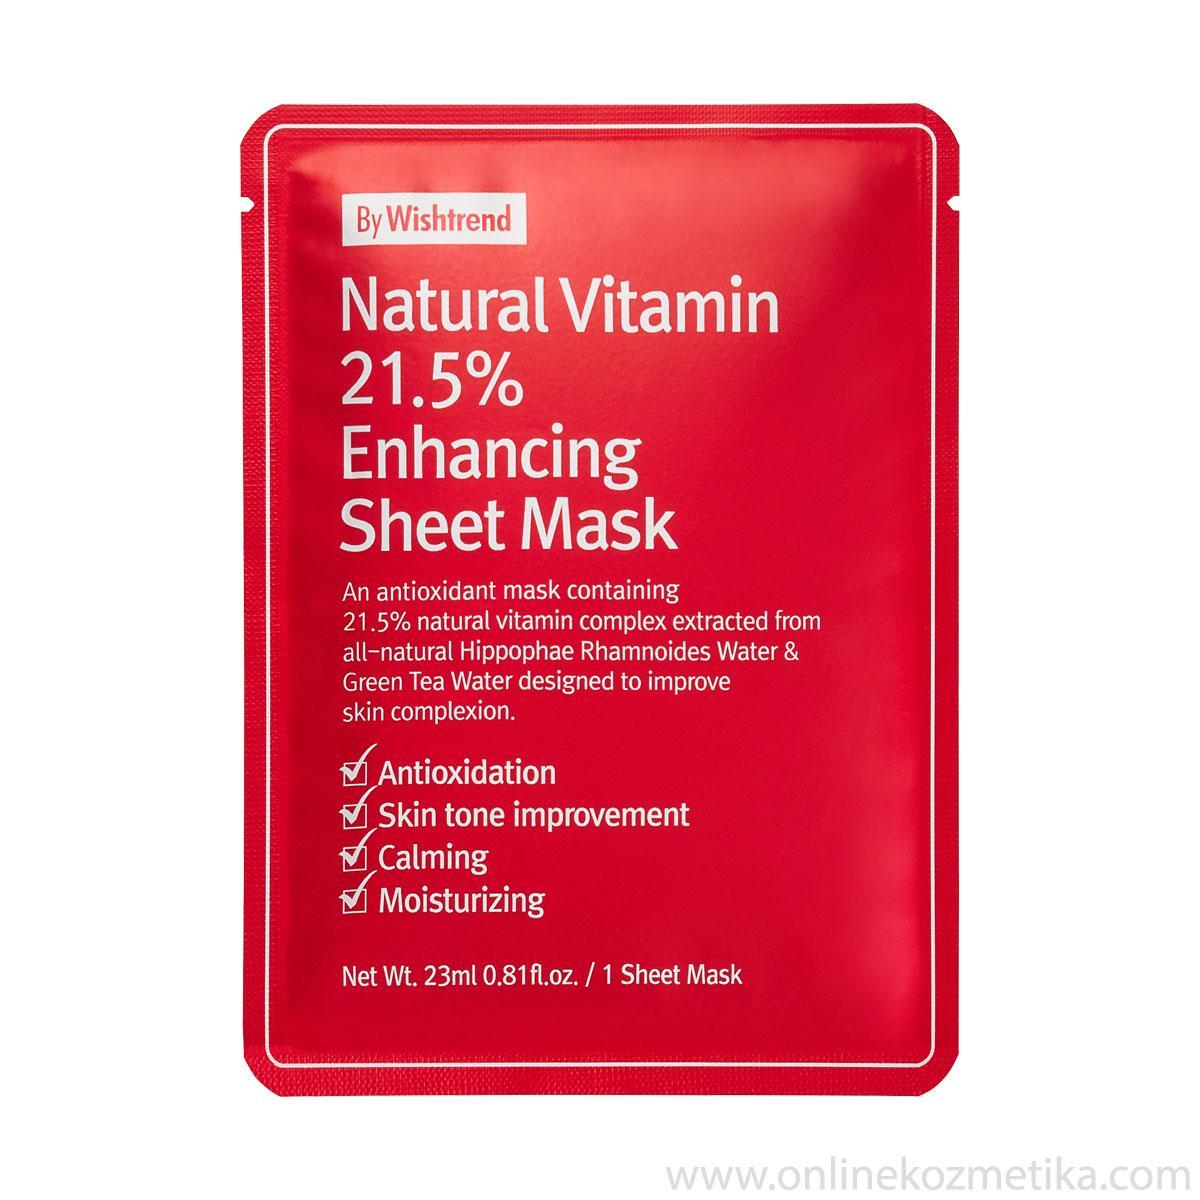 BY WISHTREND NAT VIT 21.5% ENHANCING SHEET MASK